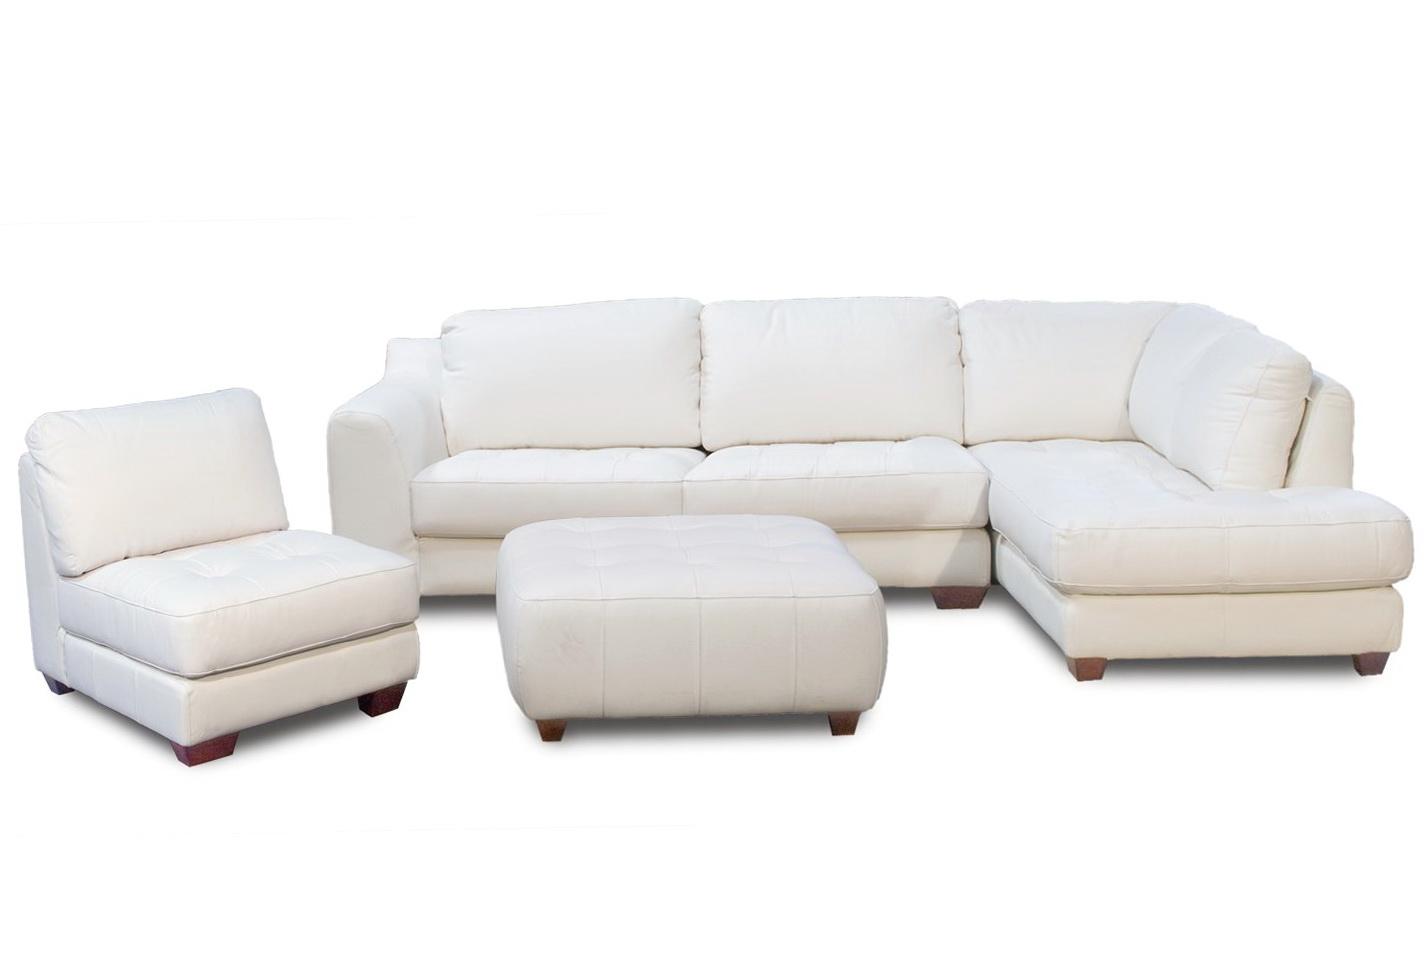 Off White Leather Ottoman